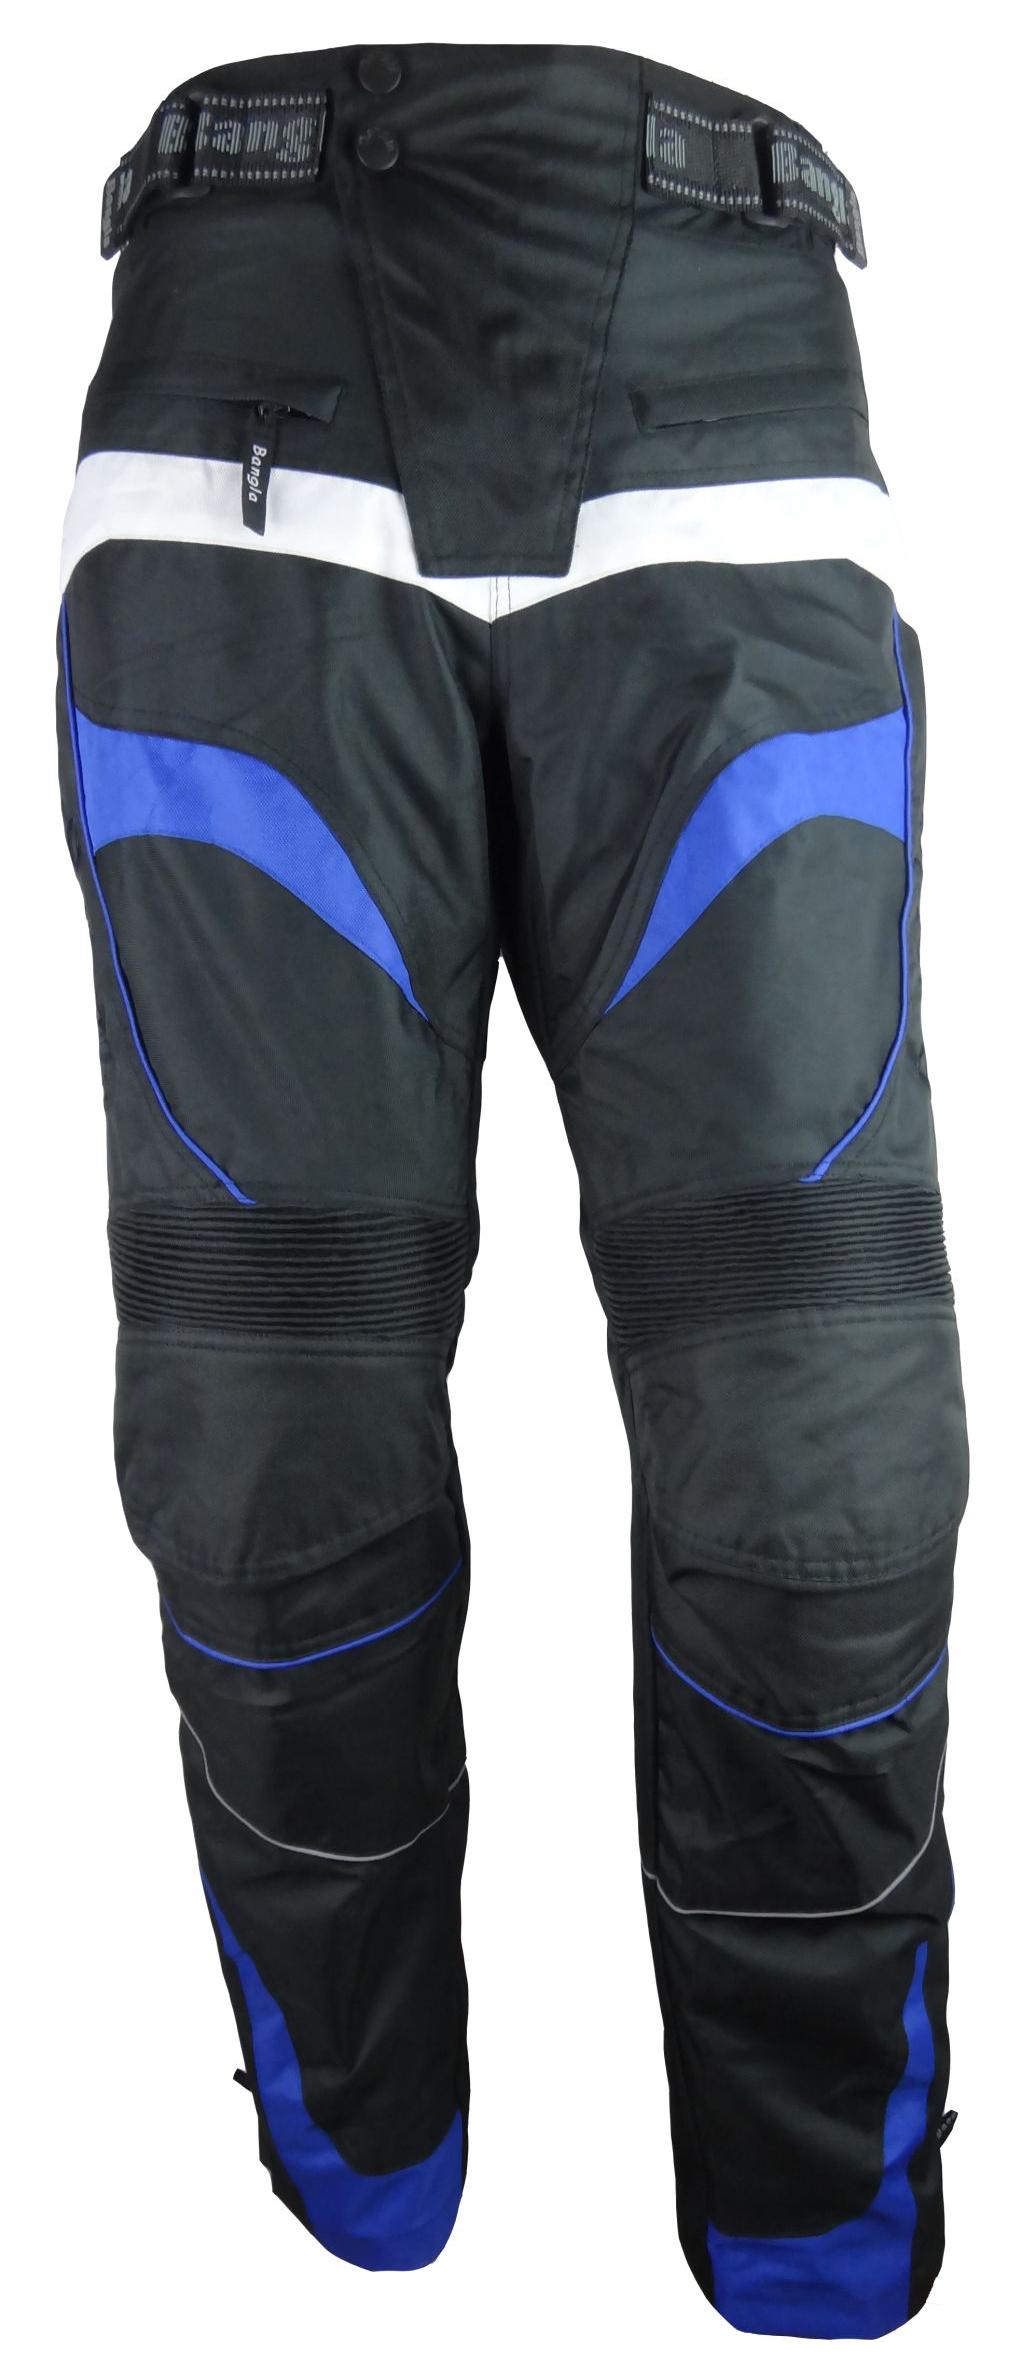 Bangla Motorrad Hose Motorradhose Textil Cordura schwarz blau weiss S - 7 XL